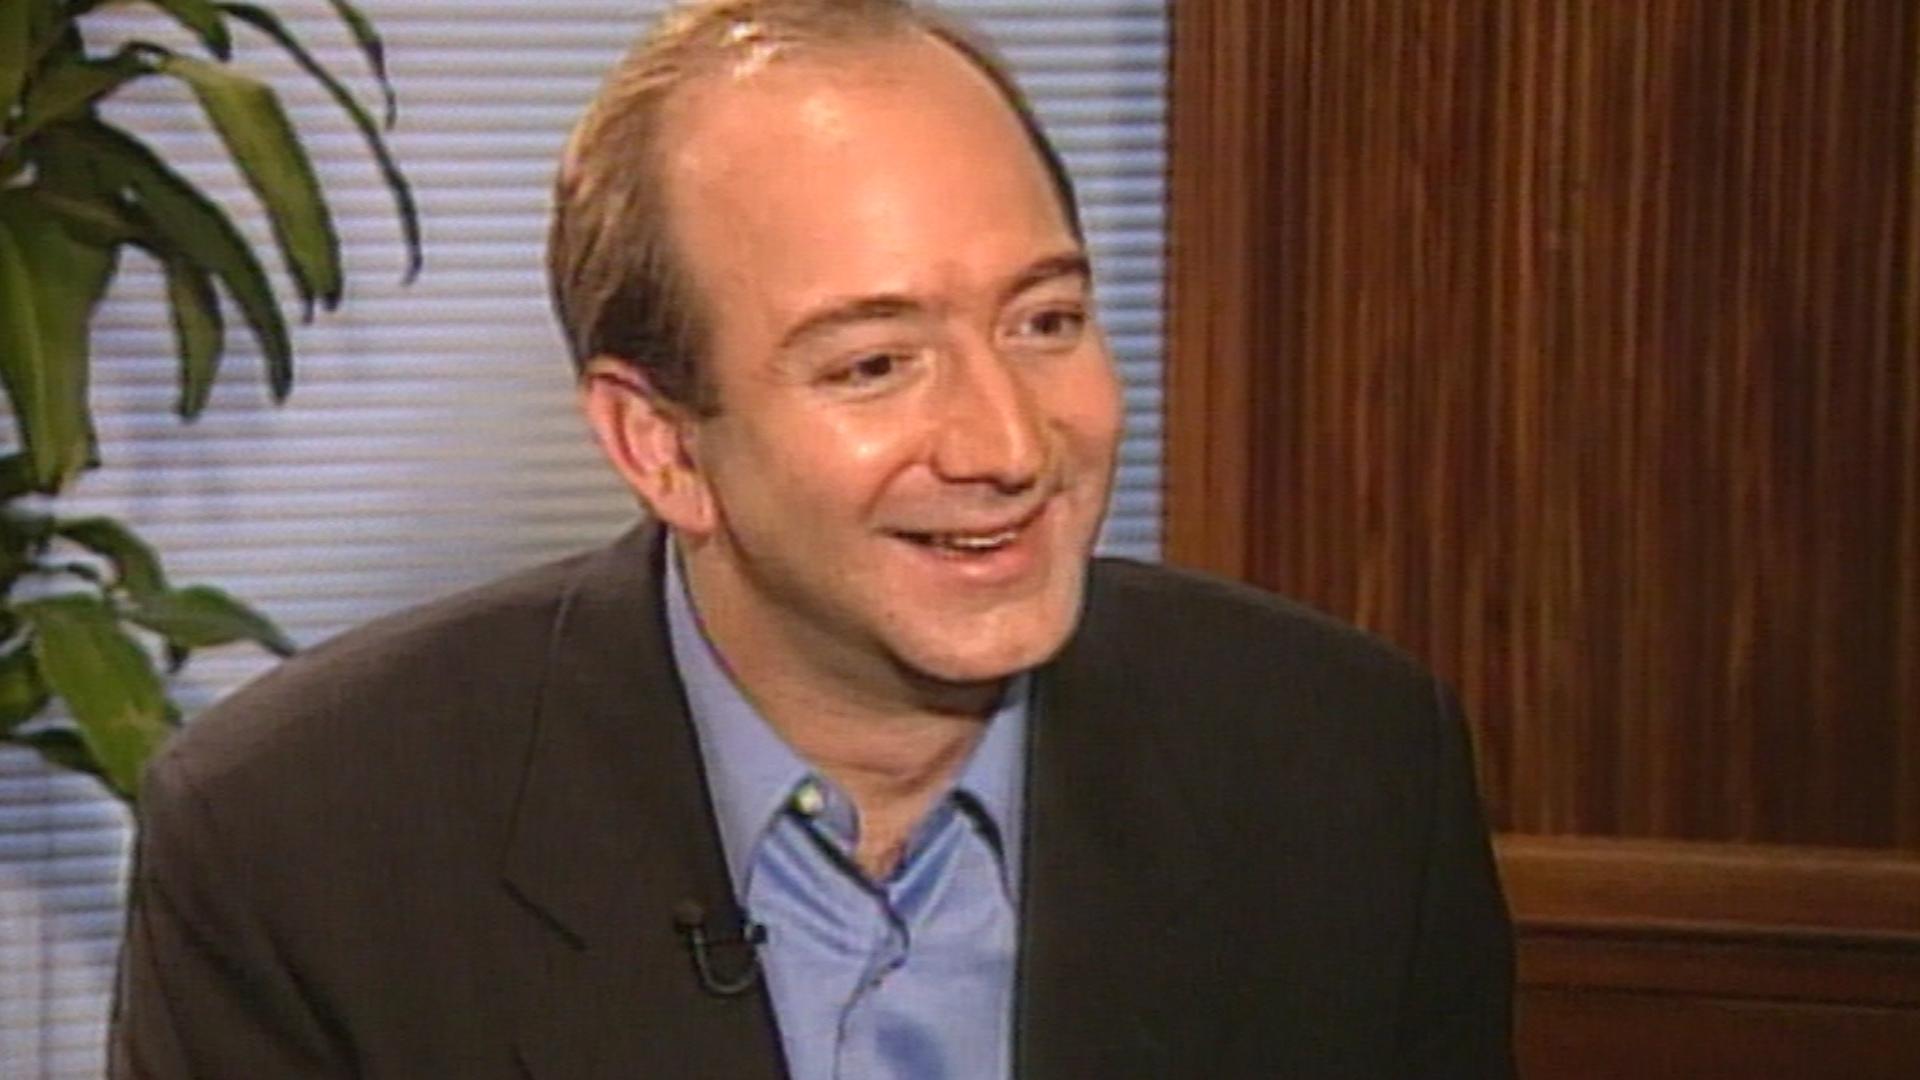 In 1999 Jeff Bezos told CNN he was ...